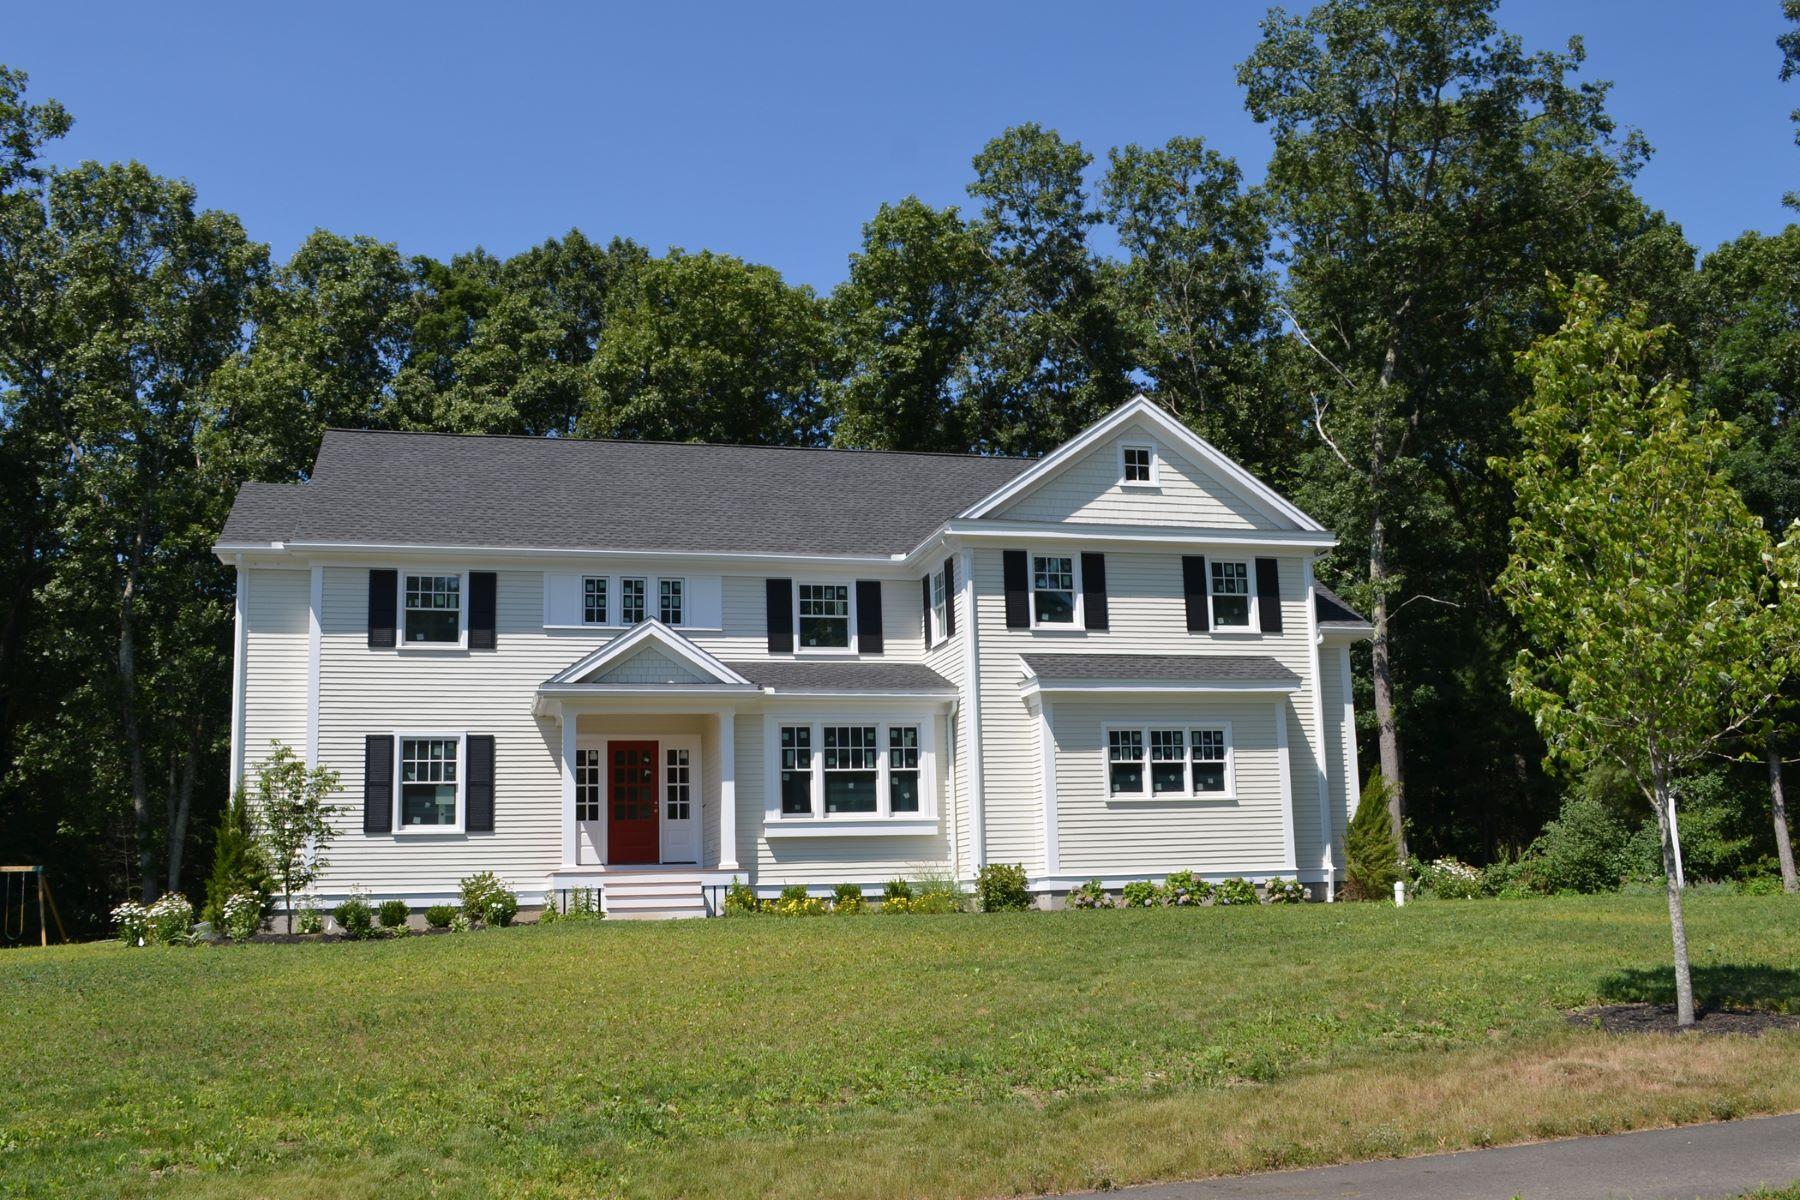 Tek Ailelik Ev için Satış at Lovely Colonial at Monsen Farm Lot 7 Monsen Road Concord, Massachusetts, 01742 Amerika Birleşik Devletleri